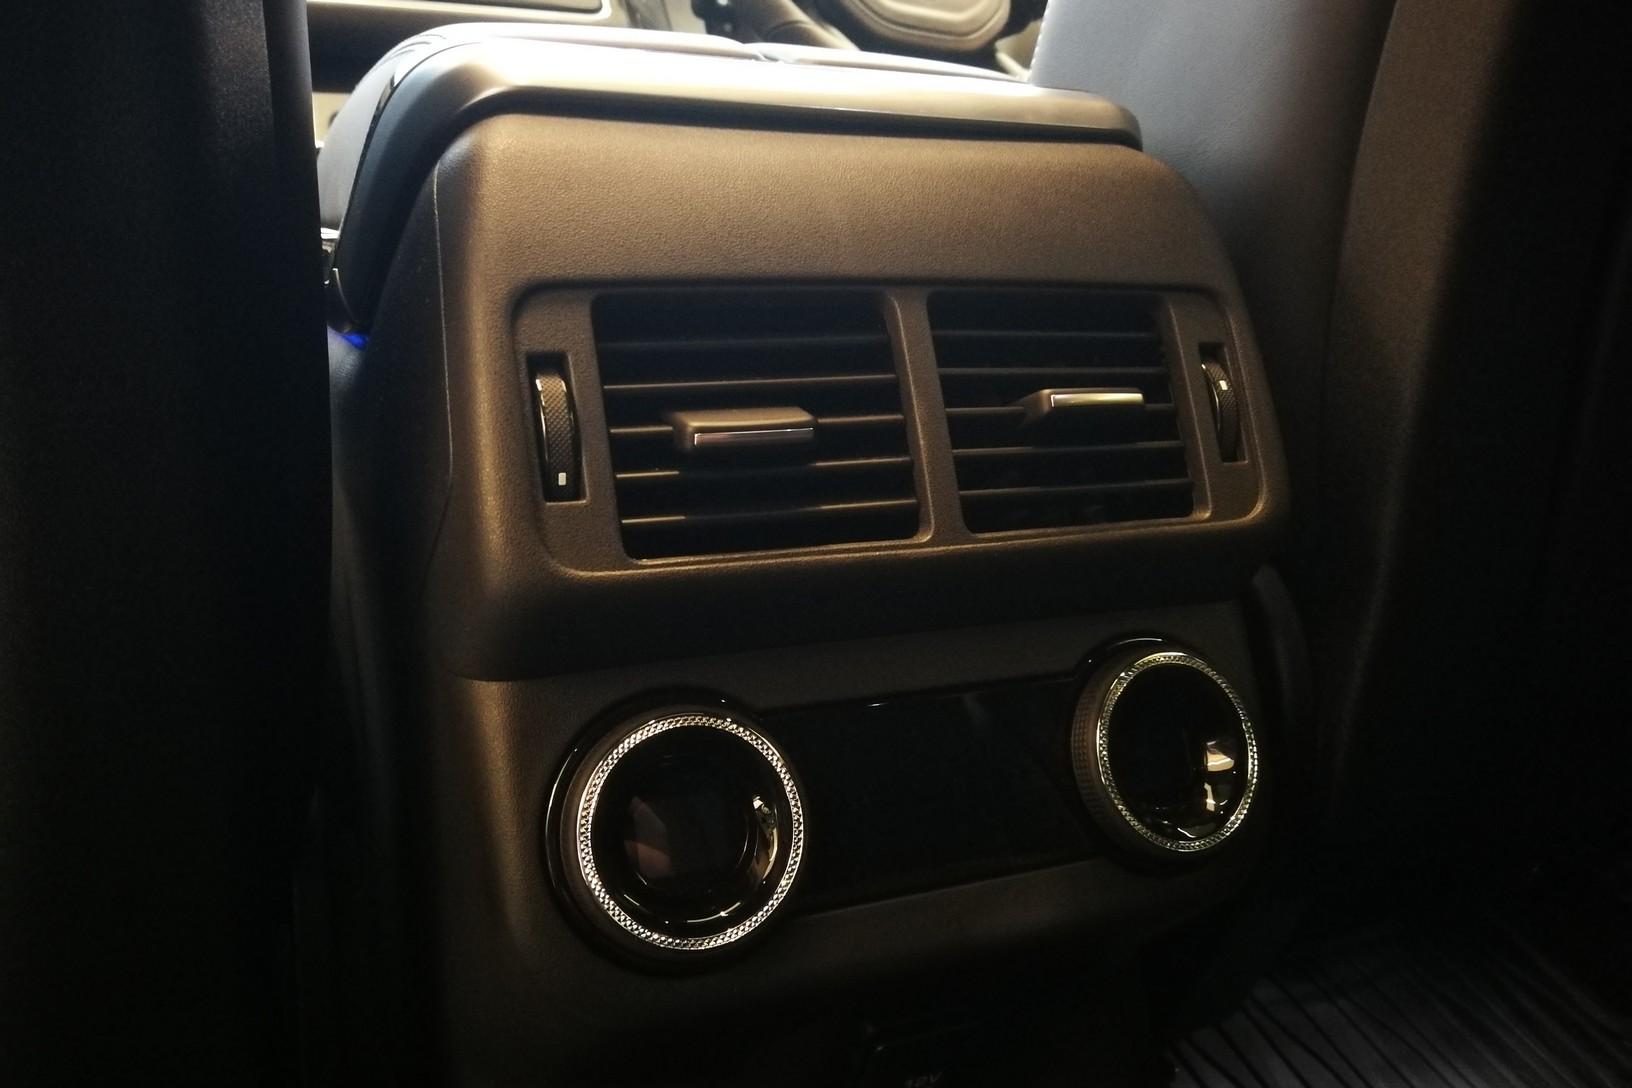 Land Rover Range Rover Velar 5.0 P550 SVAutobiography Dynamic Edition 5dr Auto image 24